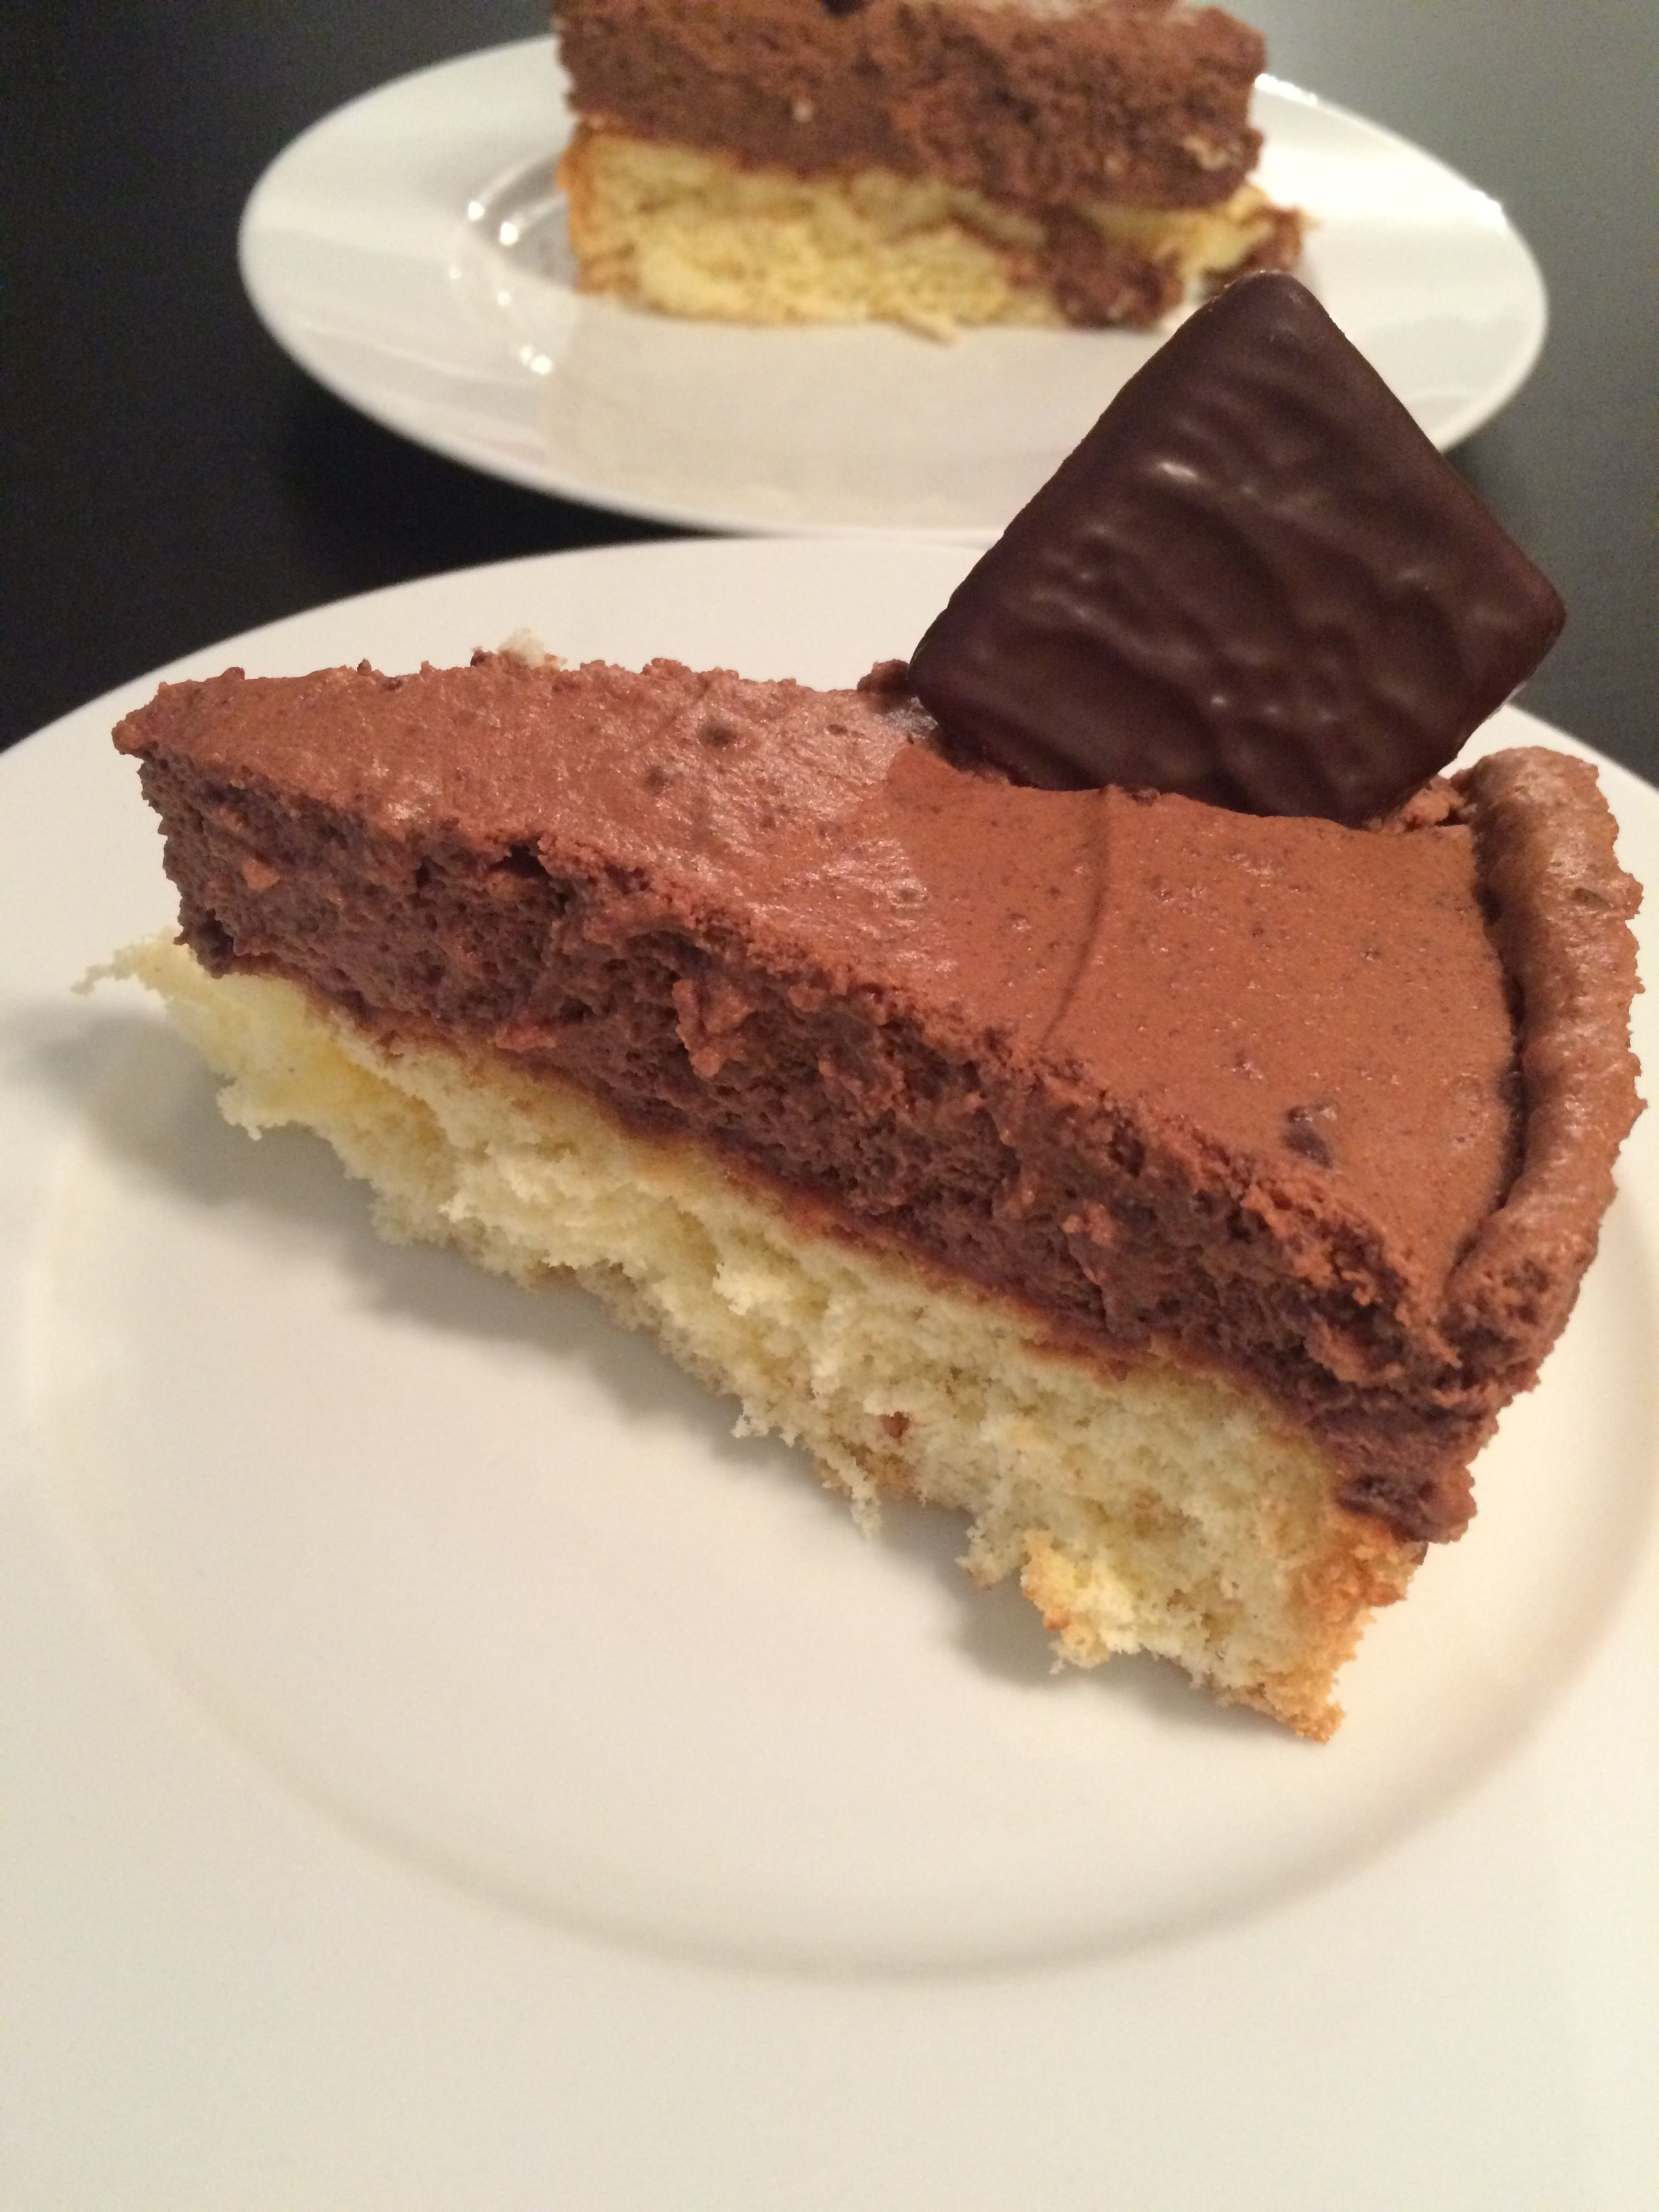 After Eight Kuchen Weil After Eight Einfach Geil Ist After